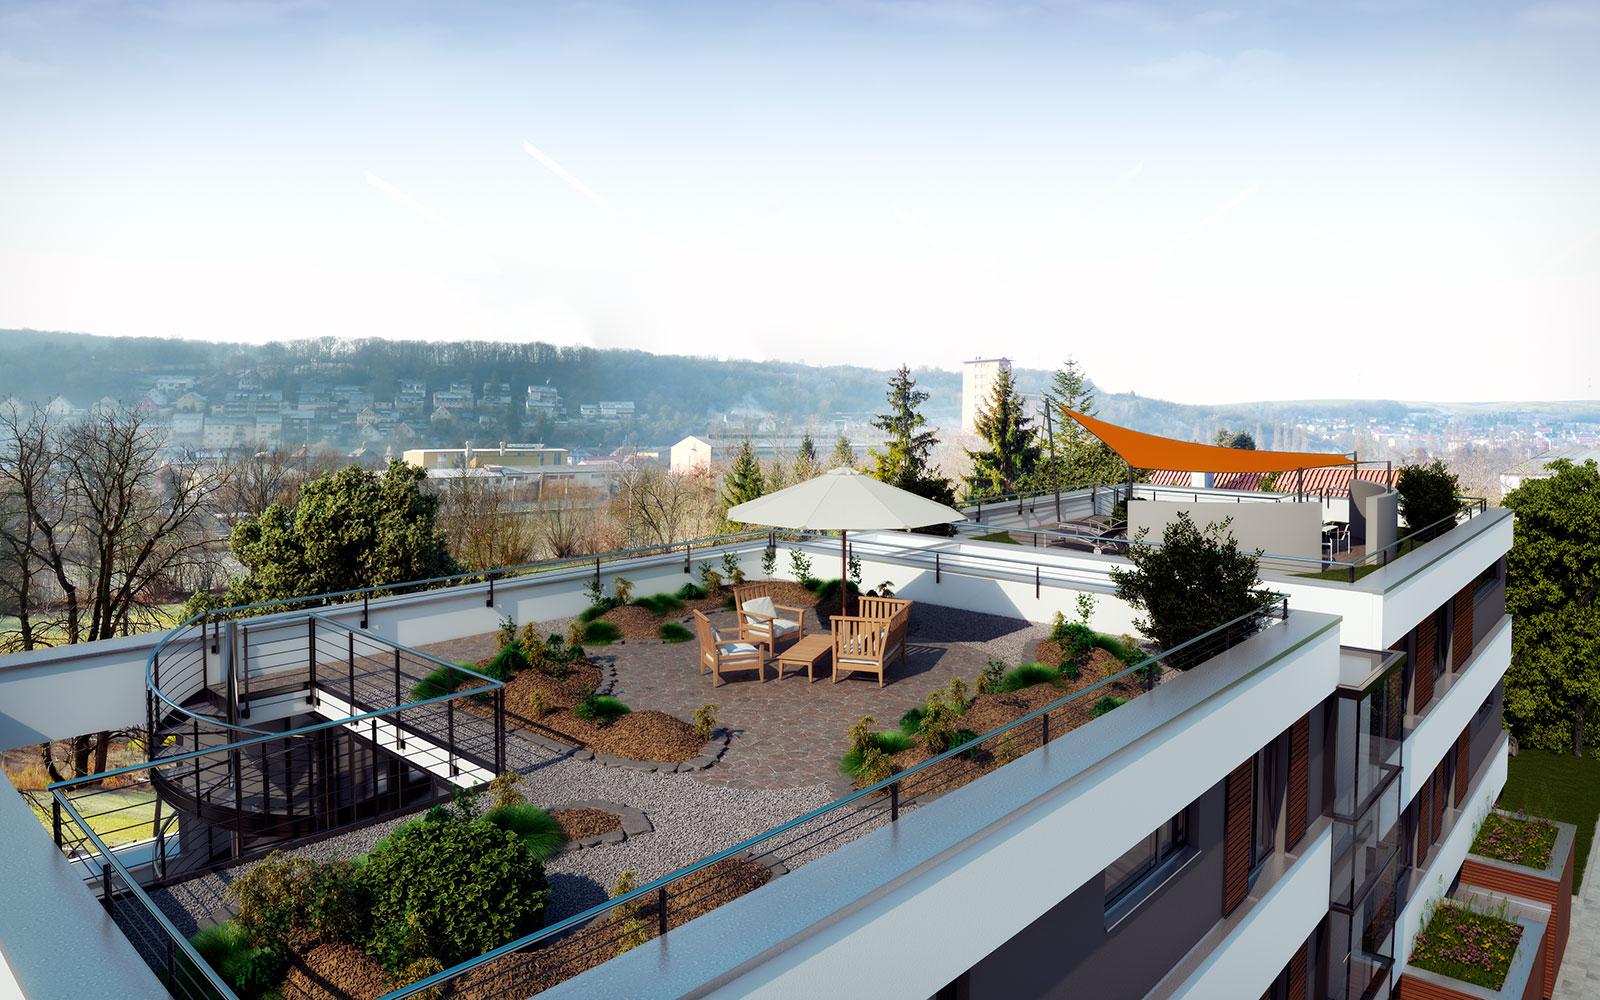 beck neubau mehrfamilienwohnhaus smart home in ochsenfurt haas haas architekt i. Black Bedroom Furniture Sets. Home Design Ideas